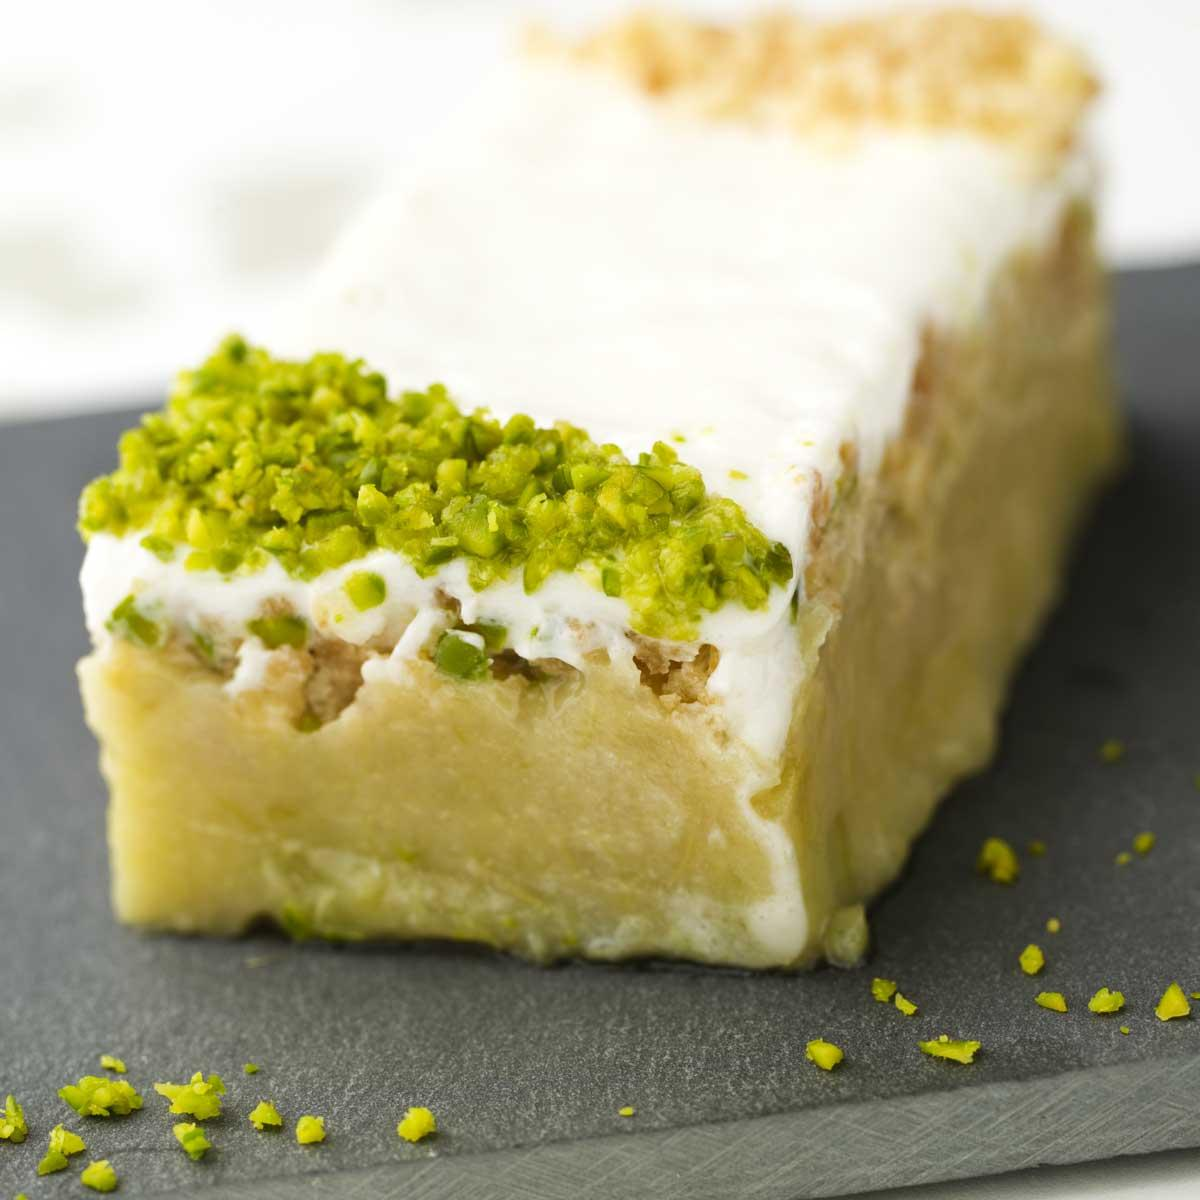 recette cake la rhubarbe pistache et yaourt cuisine madame figaro. Black Bedroom Furniture Sets. Home Design Ideas